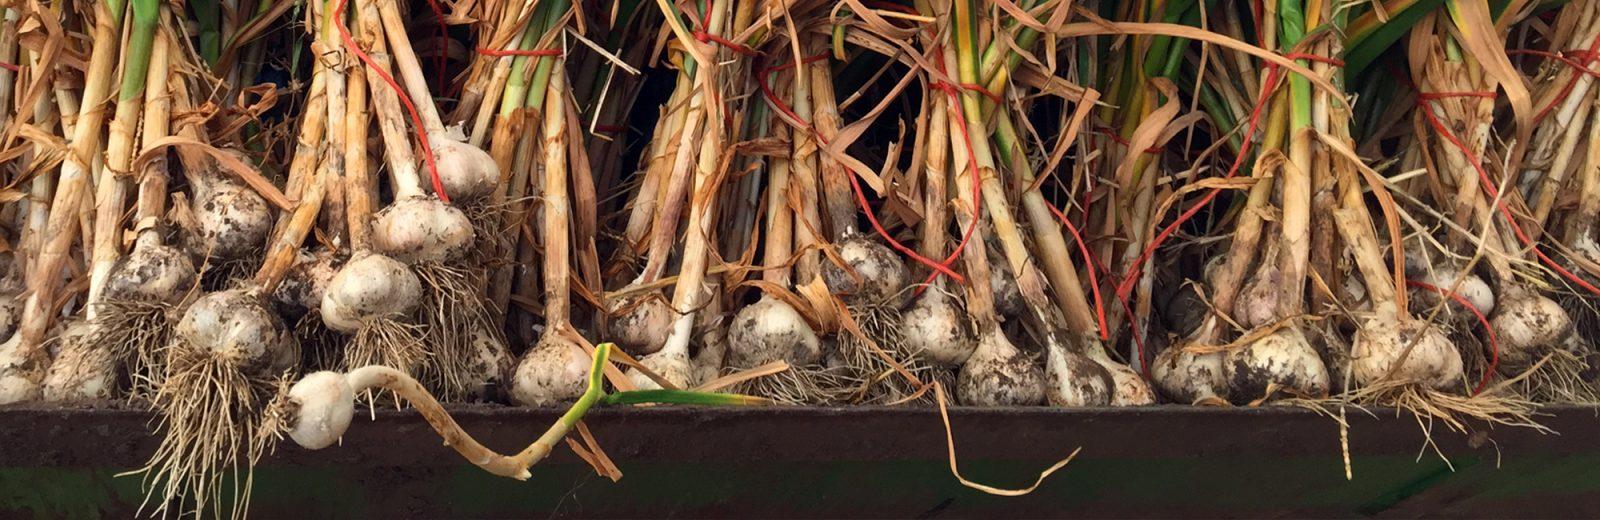 Lots of Garlic